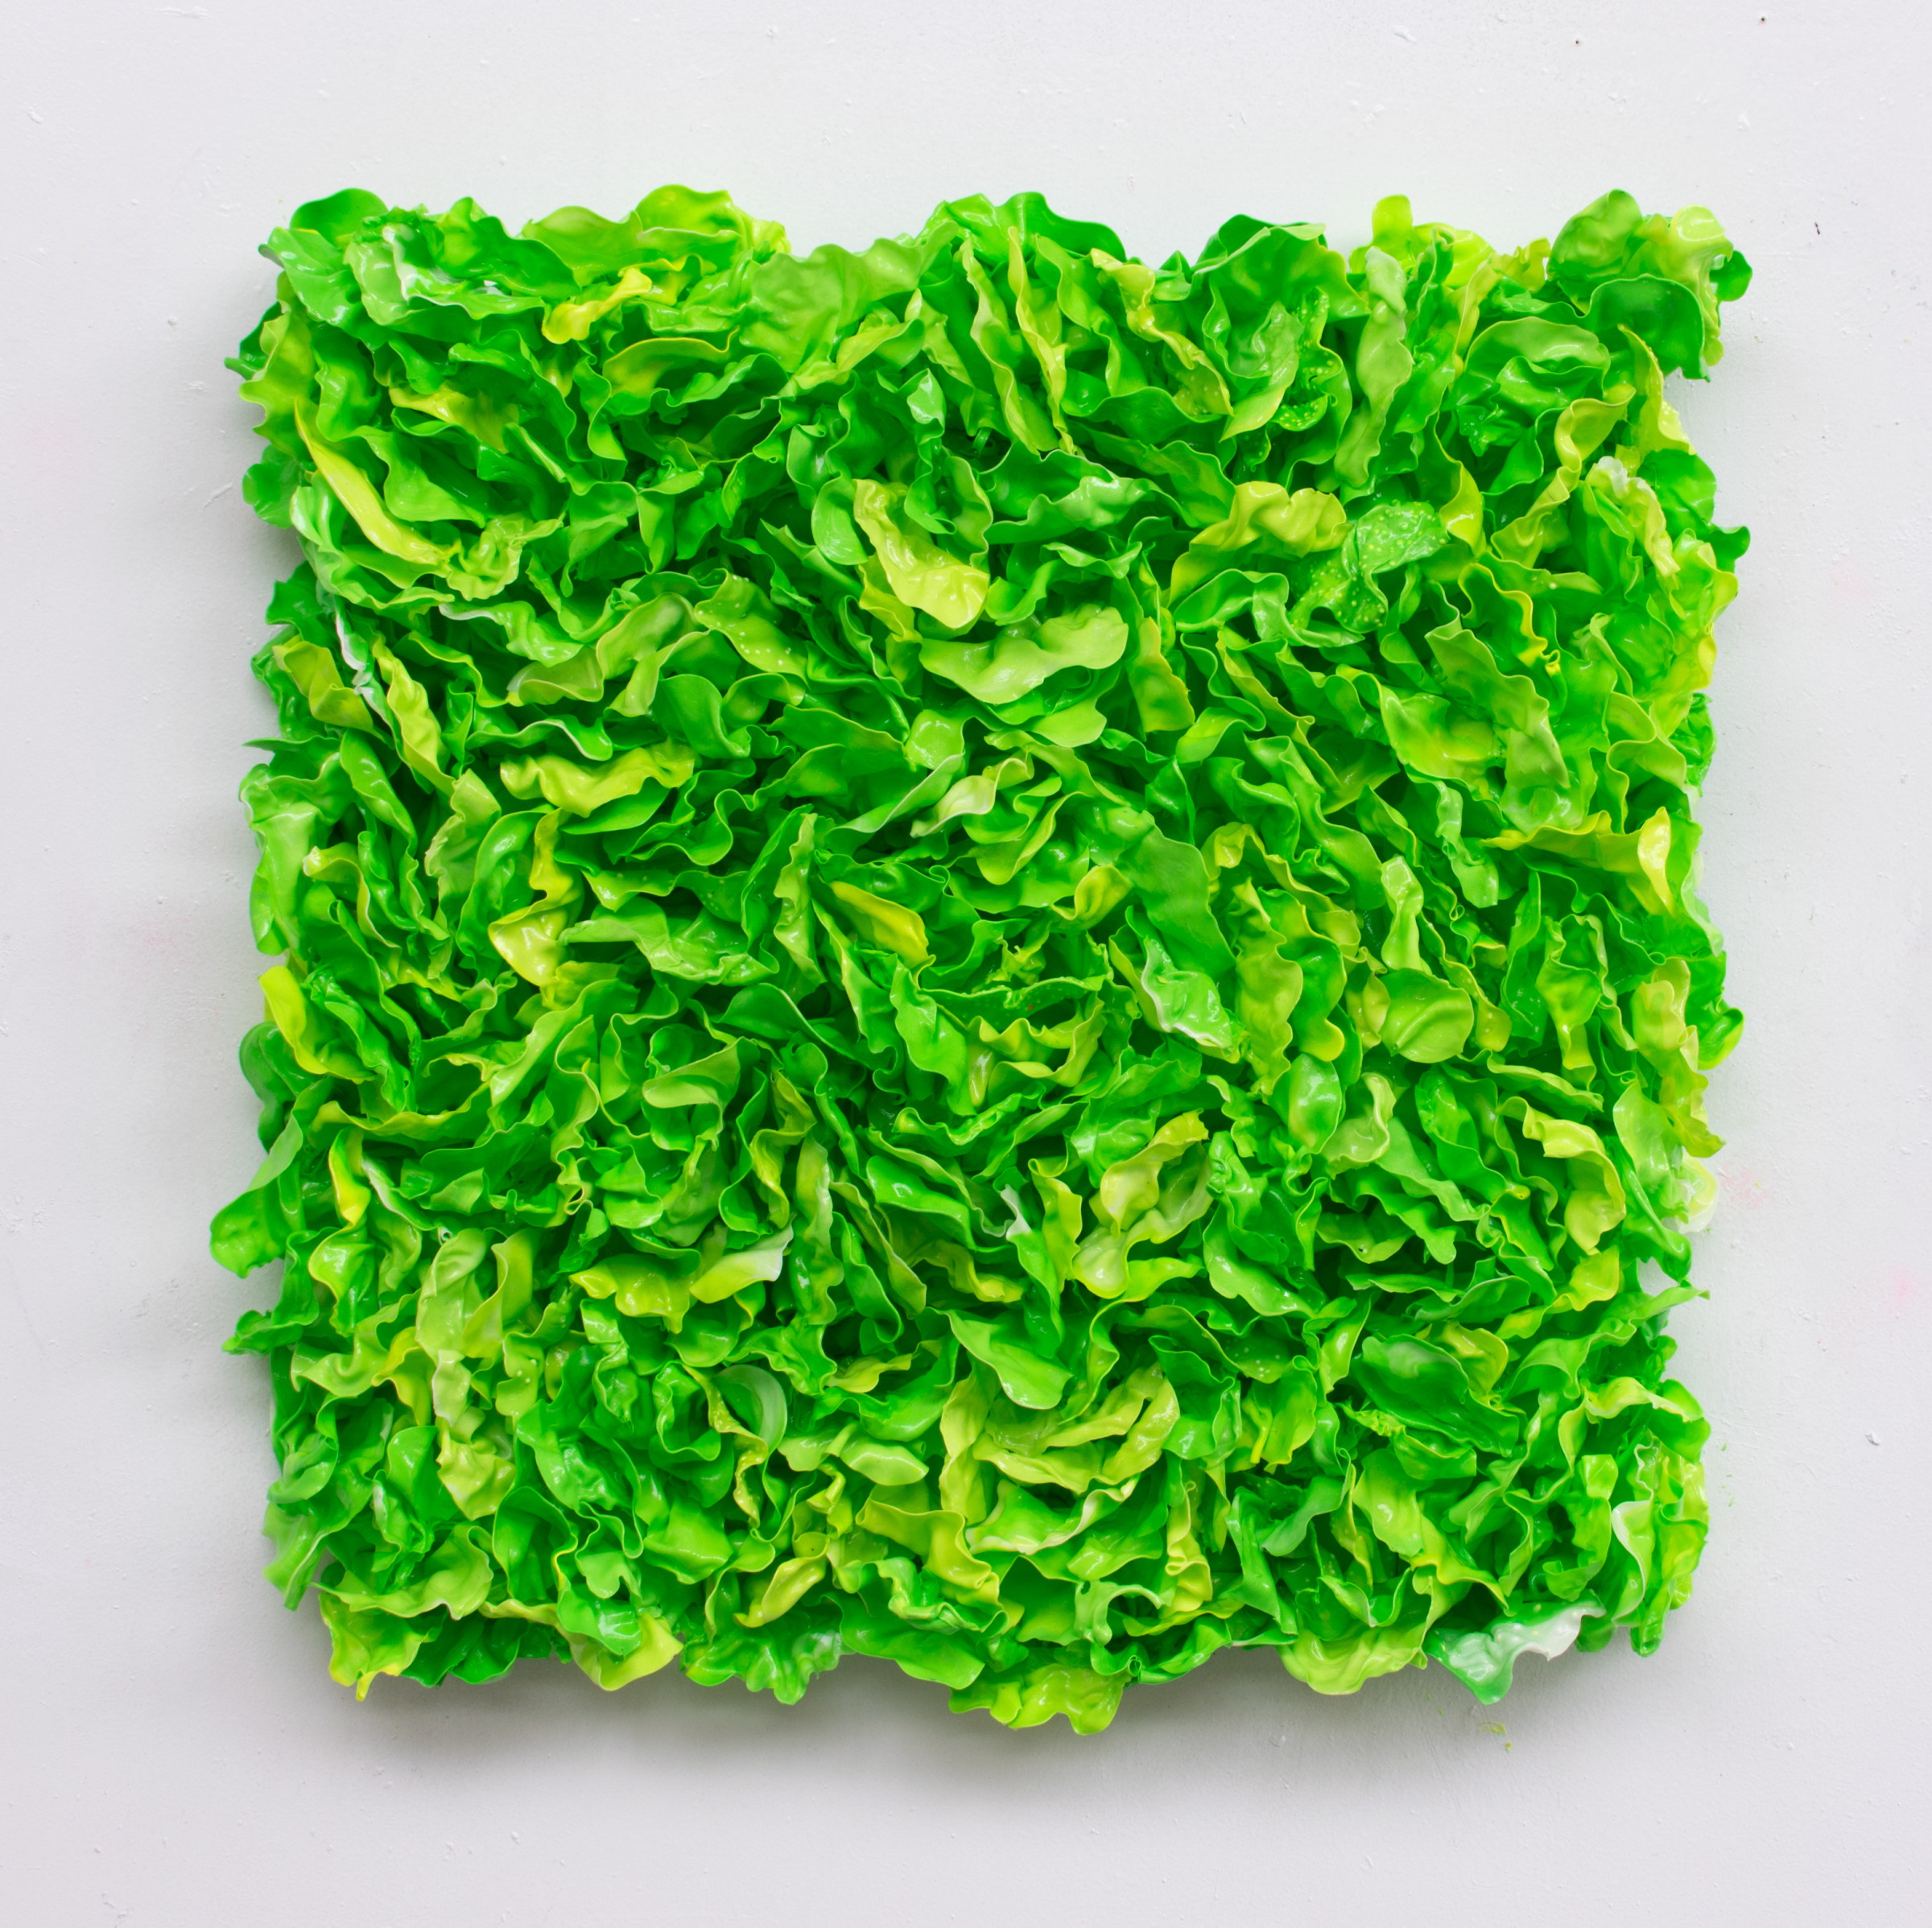 "<span class=""link fancybox-details-link""><a href=""/artists/42-stefan-gross/works/5381-stefan-gross-lettuce-i-2019/"">View Detail Page</a></span><div class=""artist""><strong>Stefan Gross</strong></div> <div class=""title""><em>Lettuce - I</em>, 2019</div> <div class=""medium"">Oil plastic</div> <div class=""dimensions"">100 x 100 x 20 cm</div><div class=""price"">€8,500.00</div>"